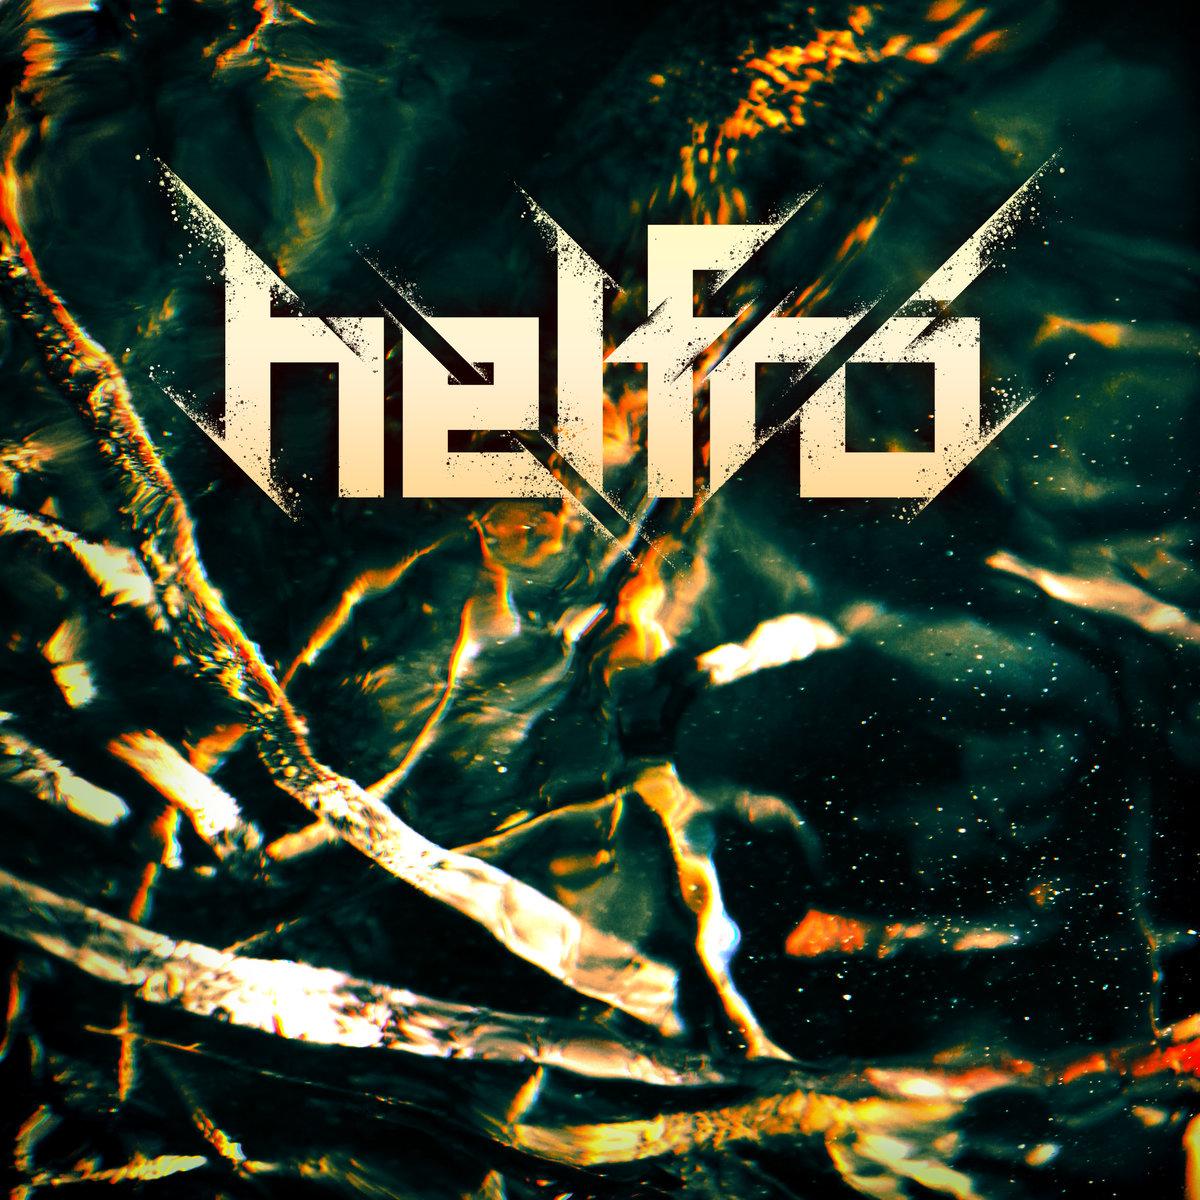 Helfró - Shredded black alchemy